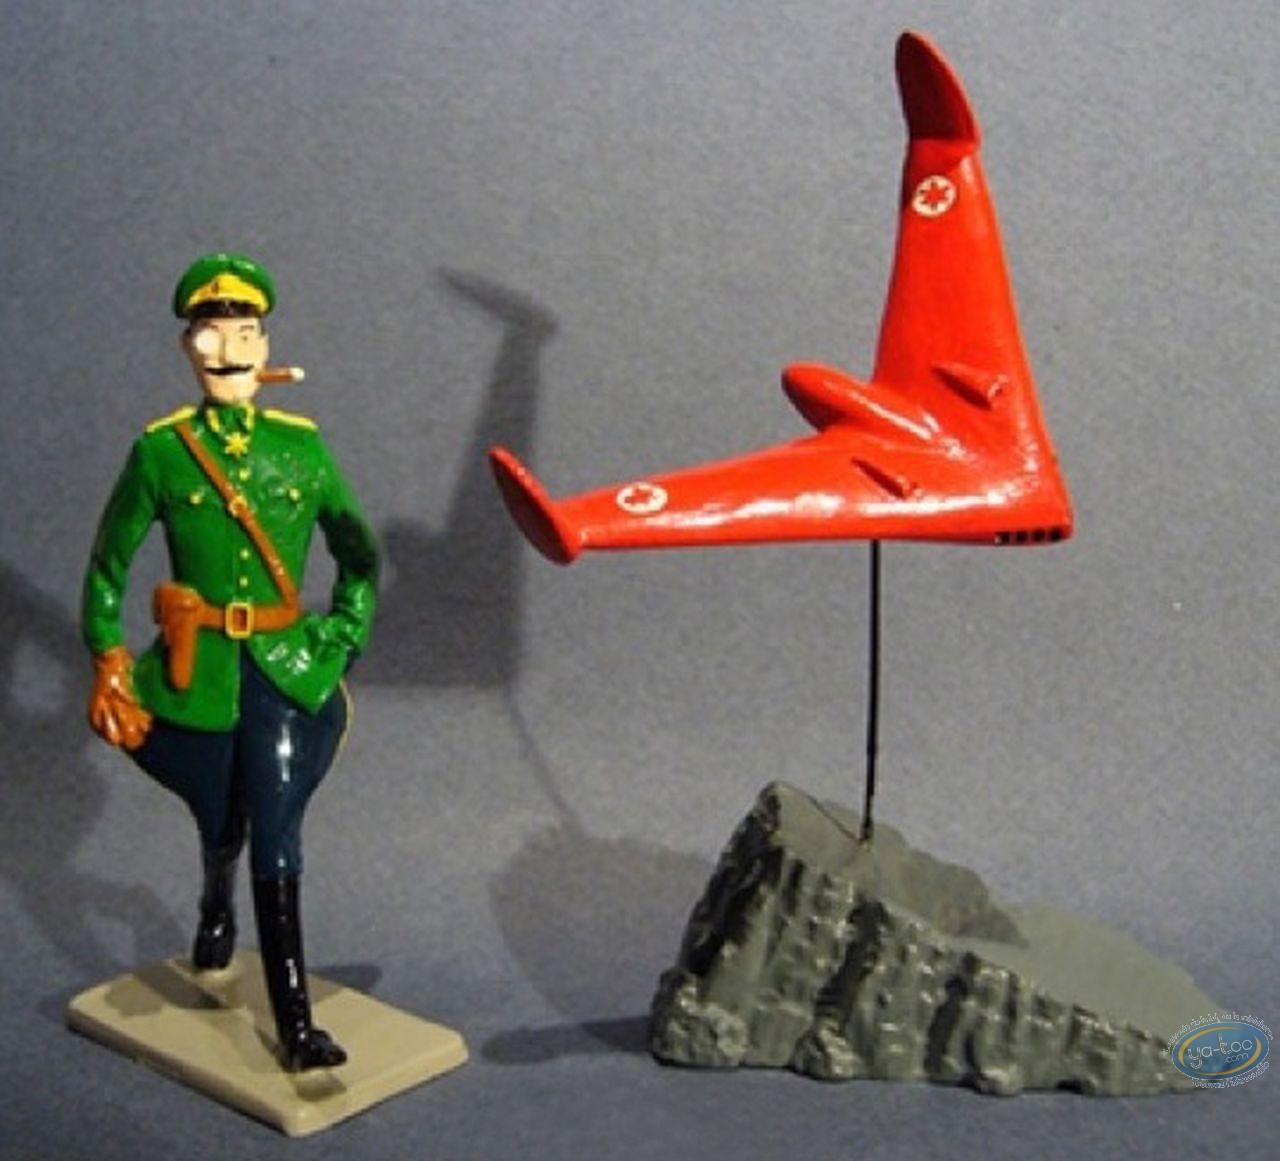 Figurine métal, Blake et Mortimer : Olrik & Aile Volante, Pixi